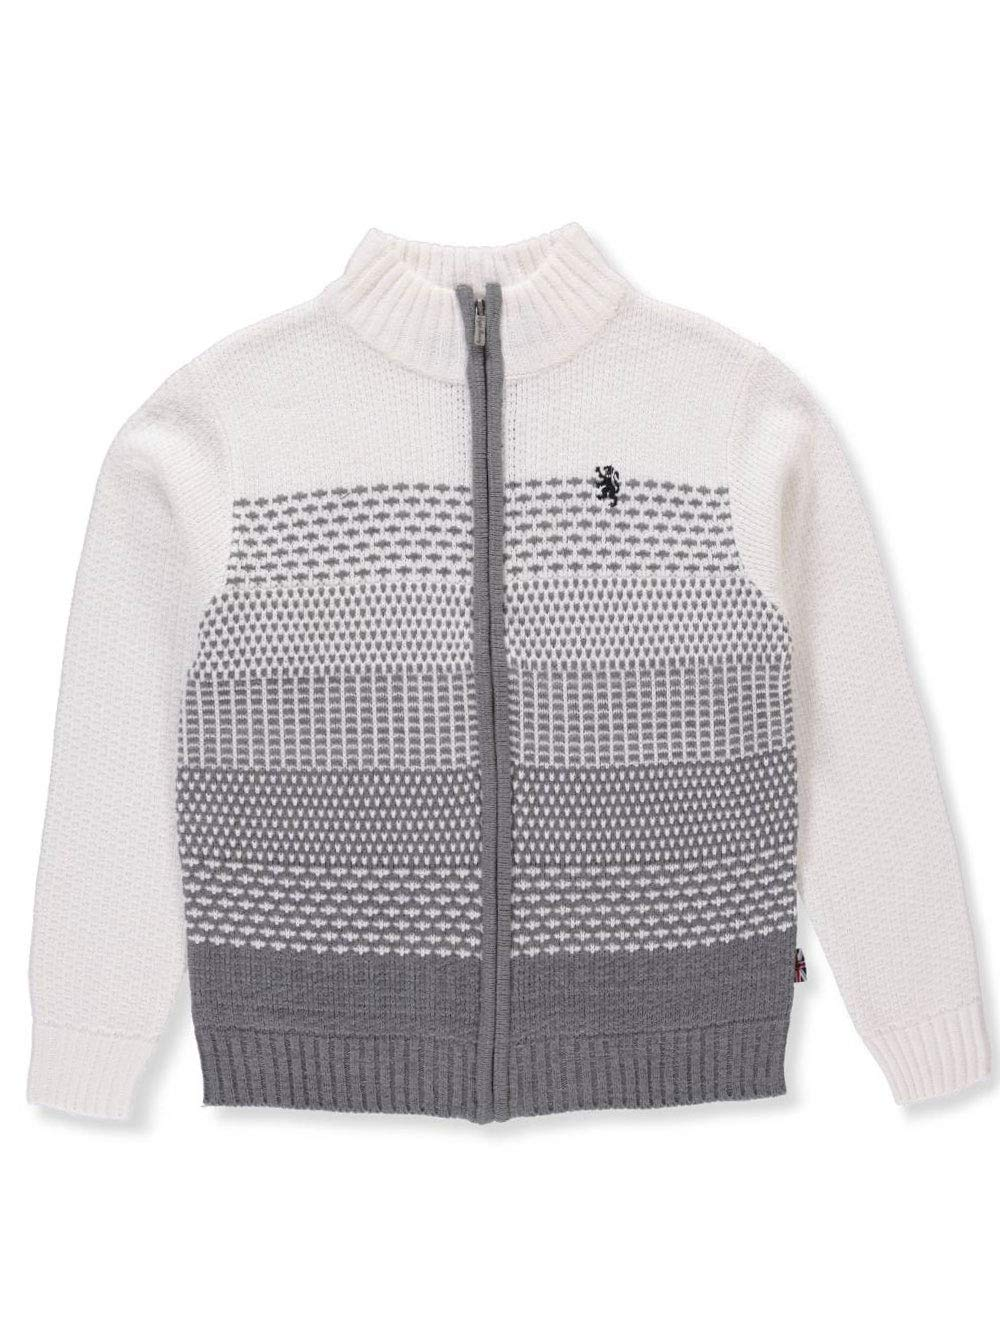 English Laundry Boys Classic Sweater SV38